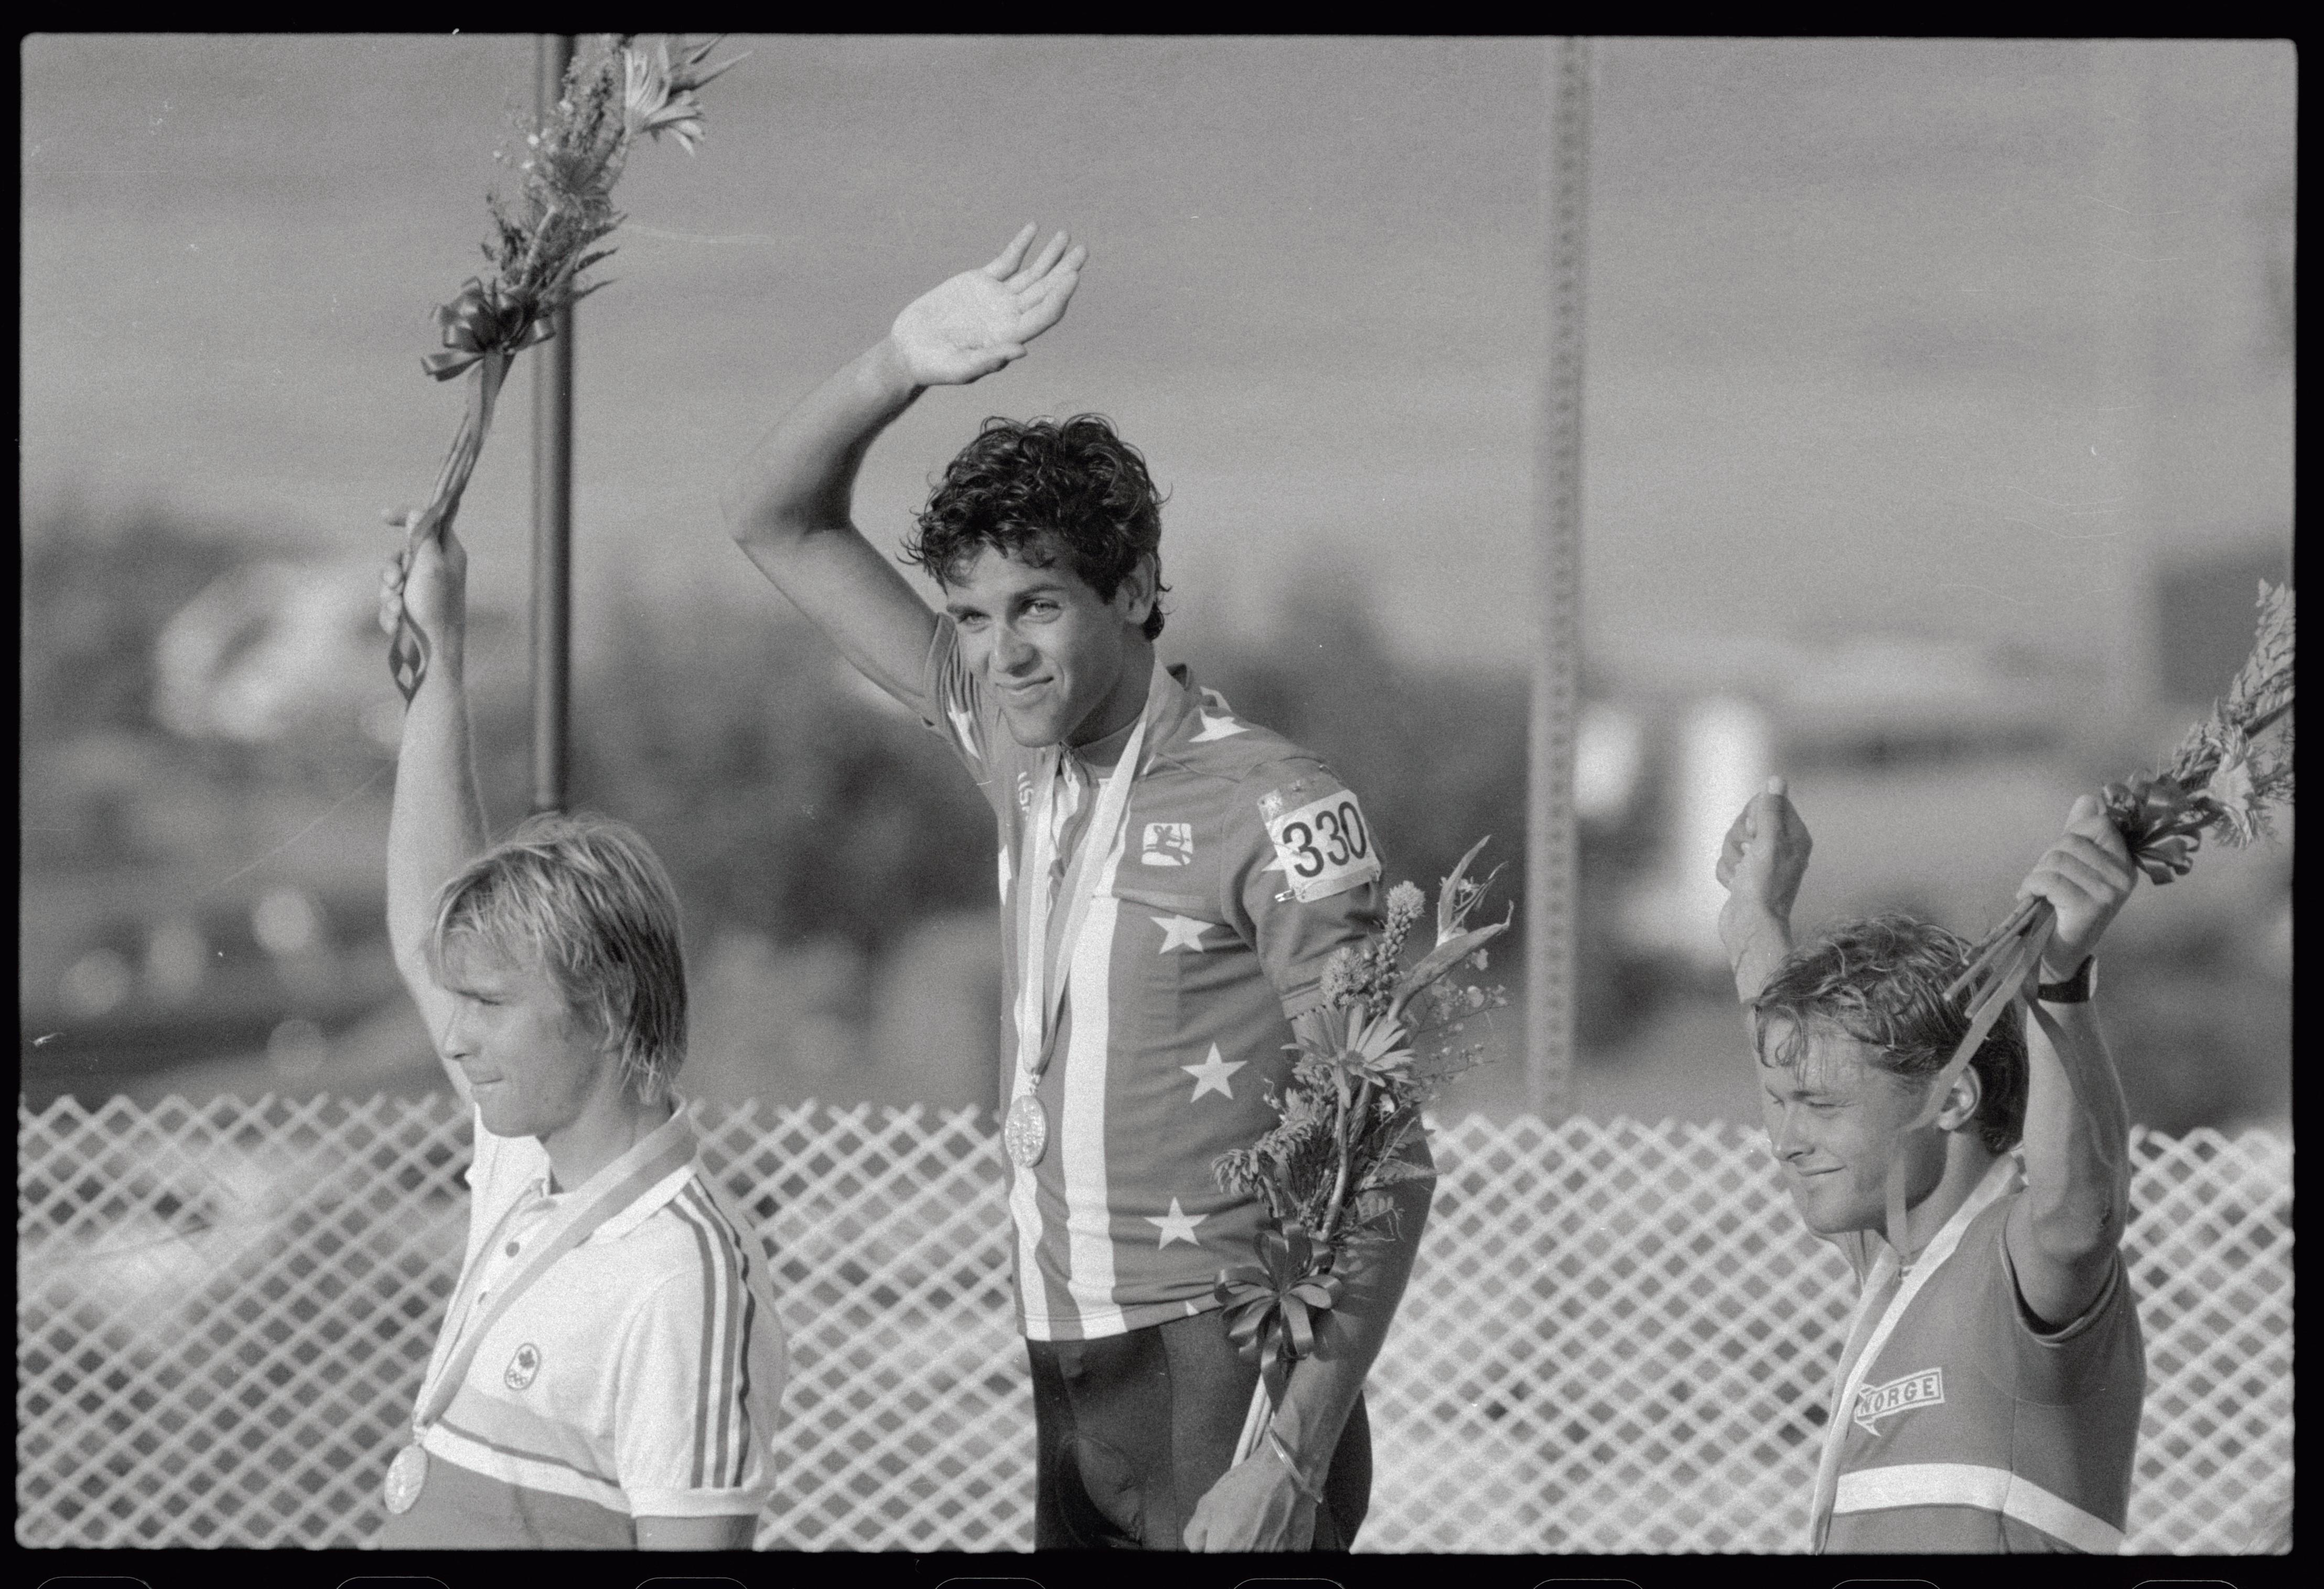 Alexi Grewal y Steve Bauer - Los Angeles 1984